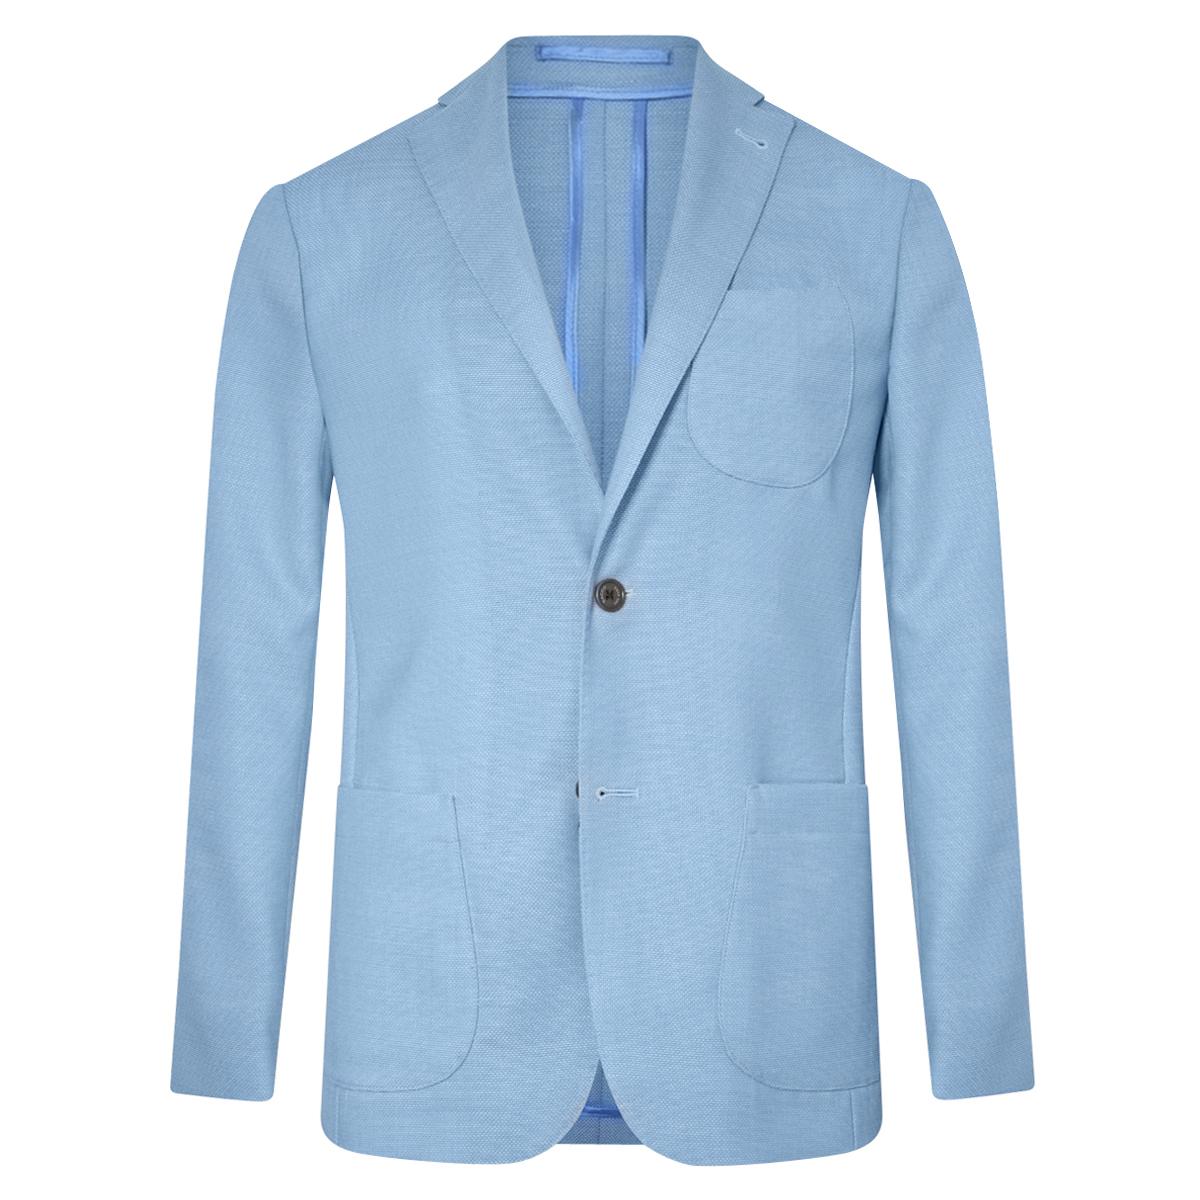 Sky Blue Unlined Single-Breasted Patch Pocket Jacket